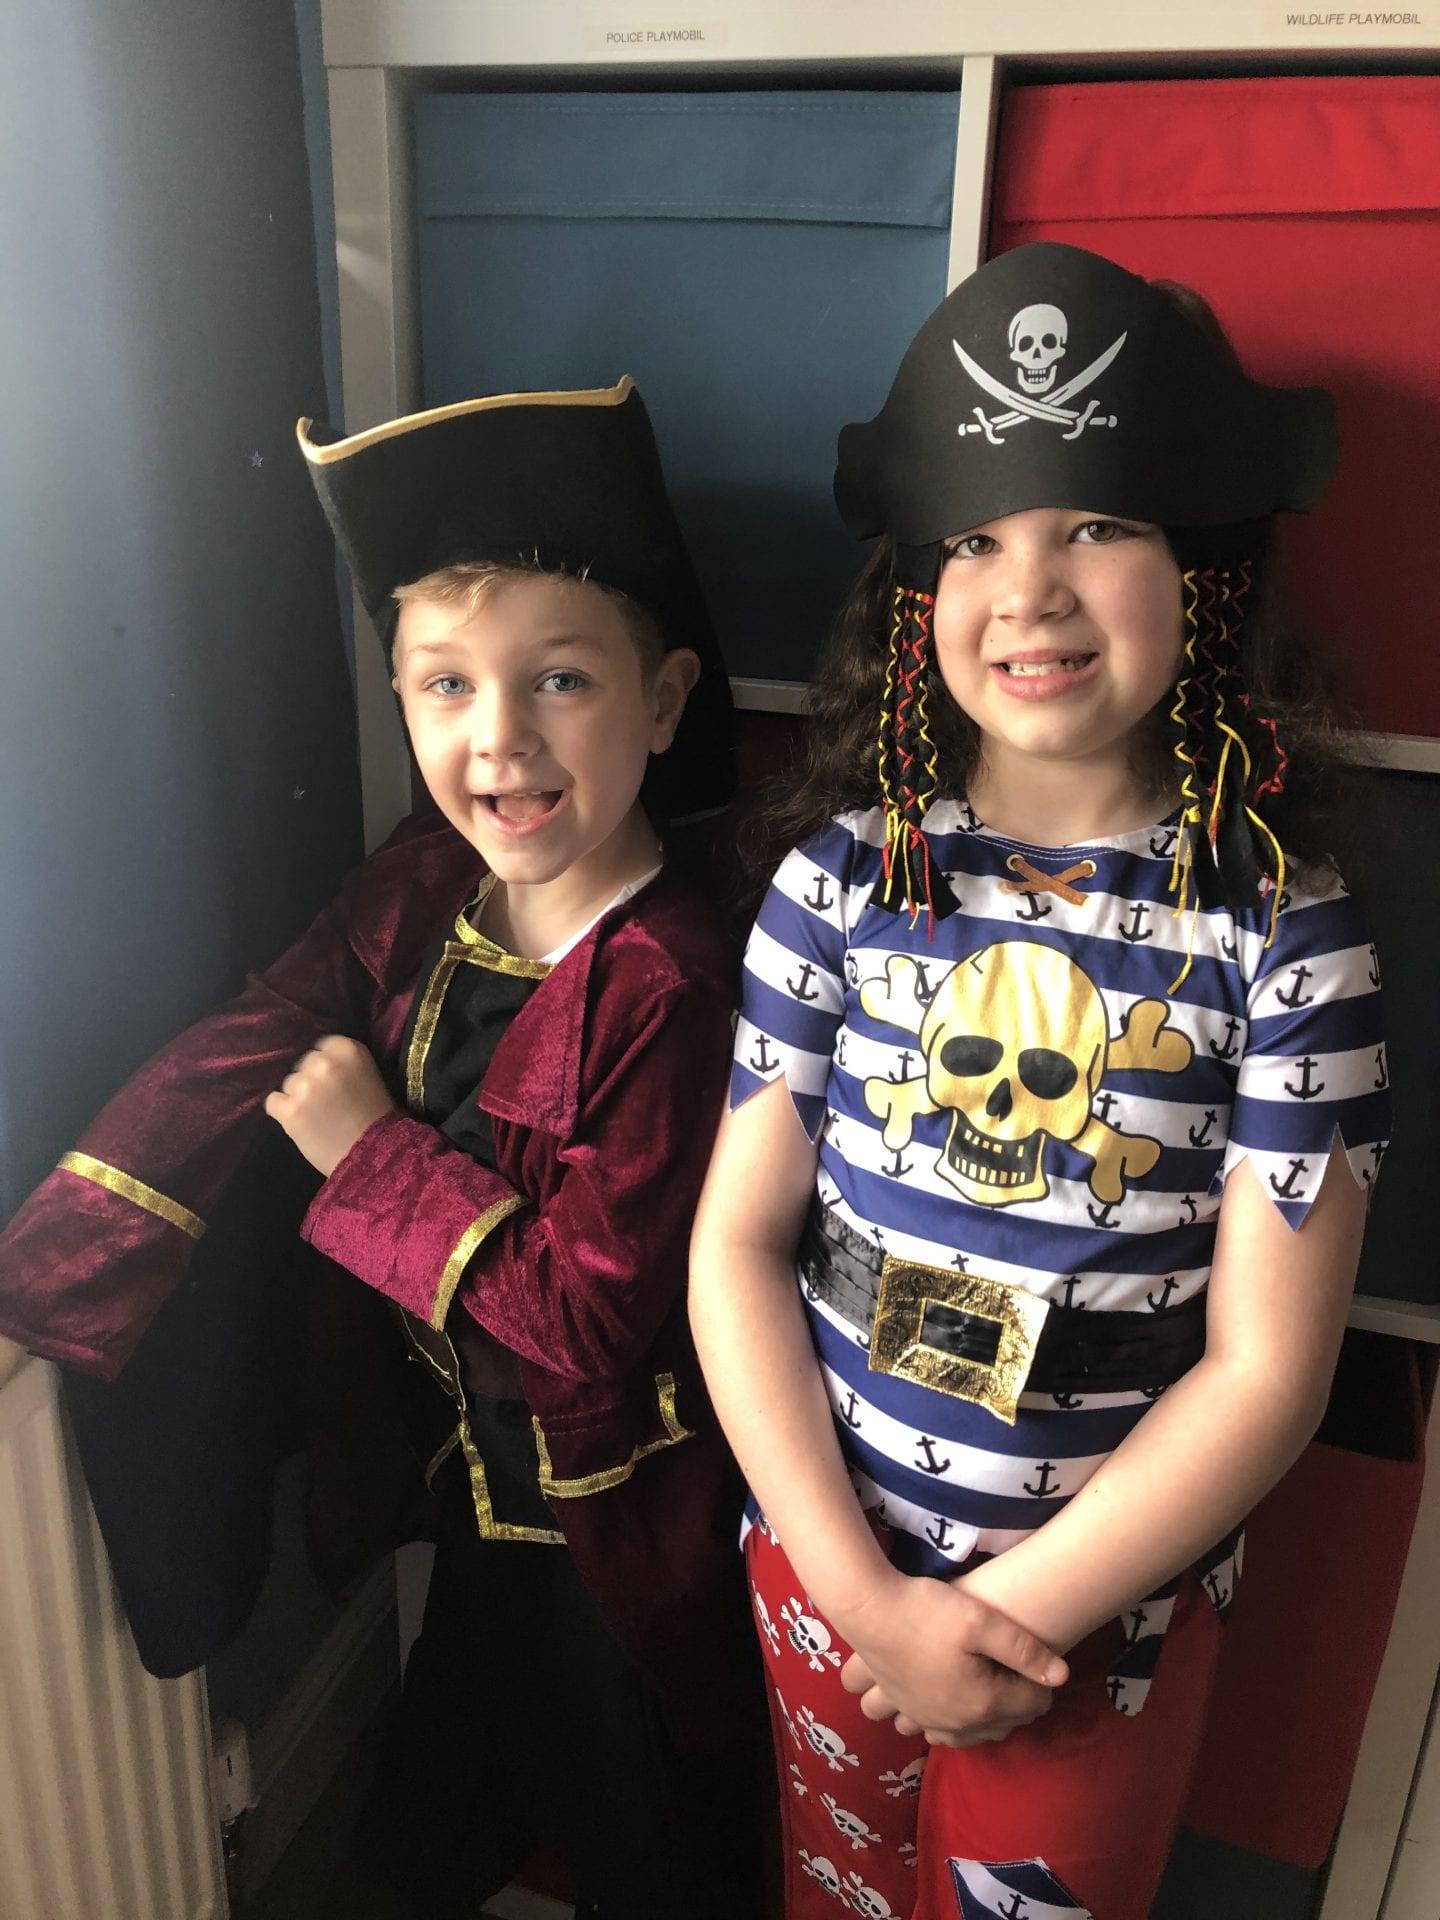 2 children dressed as pirates